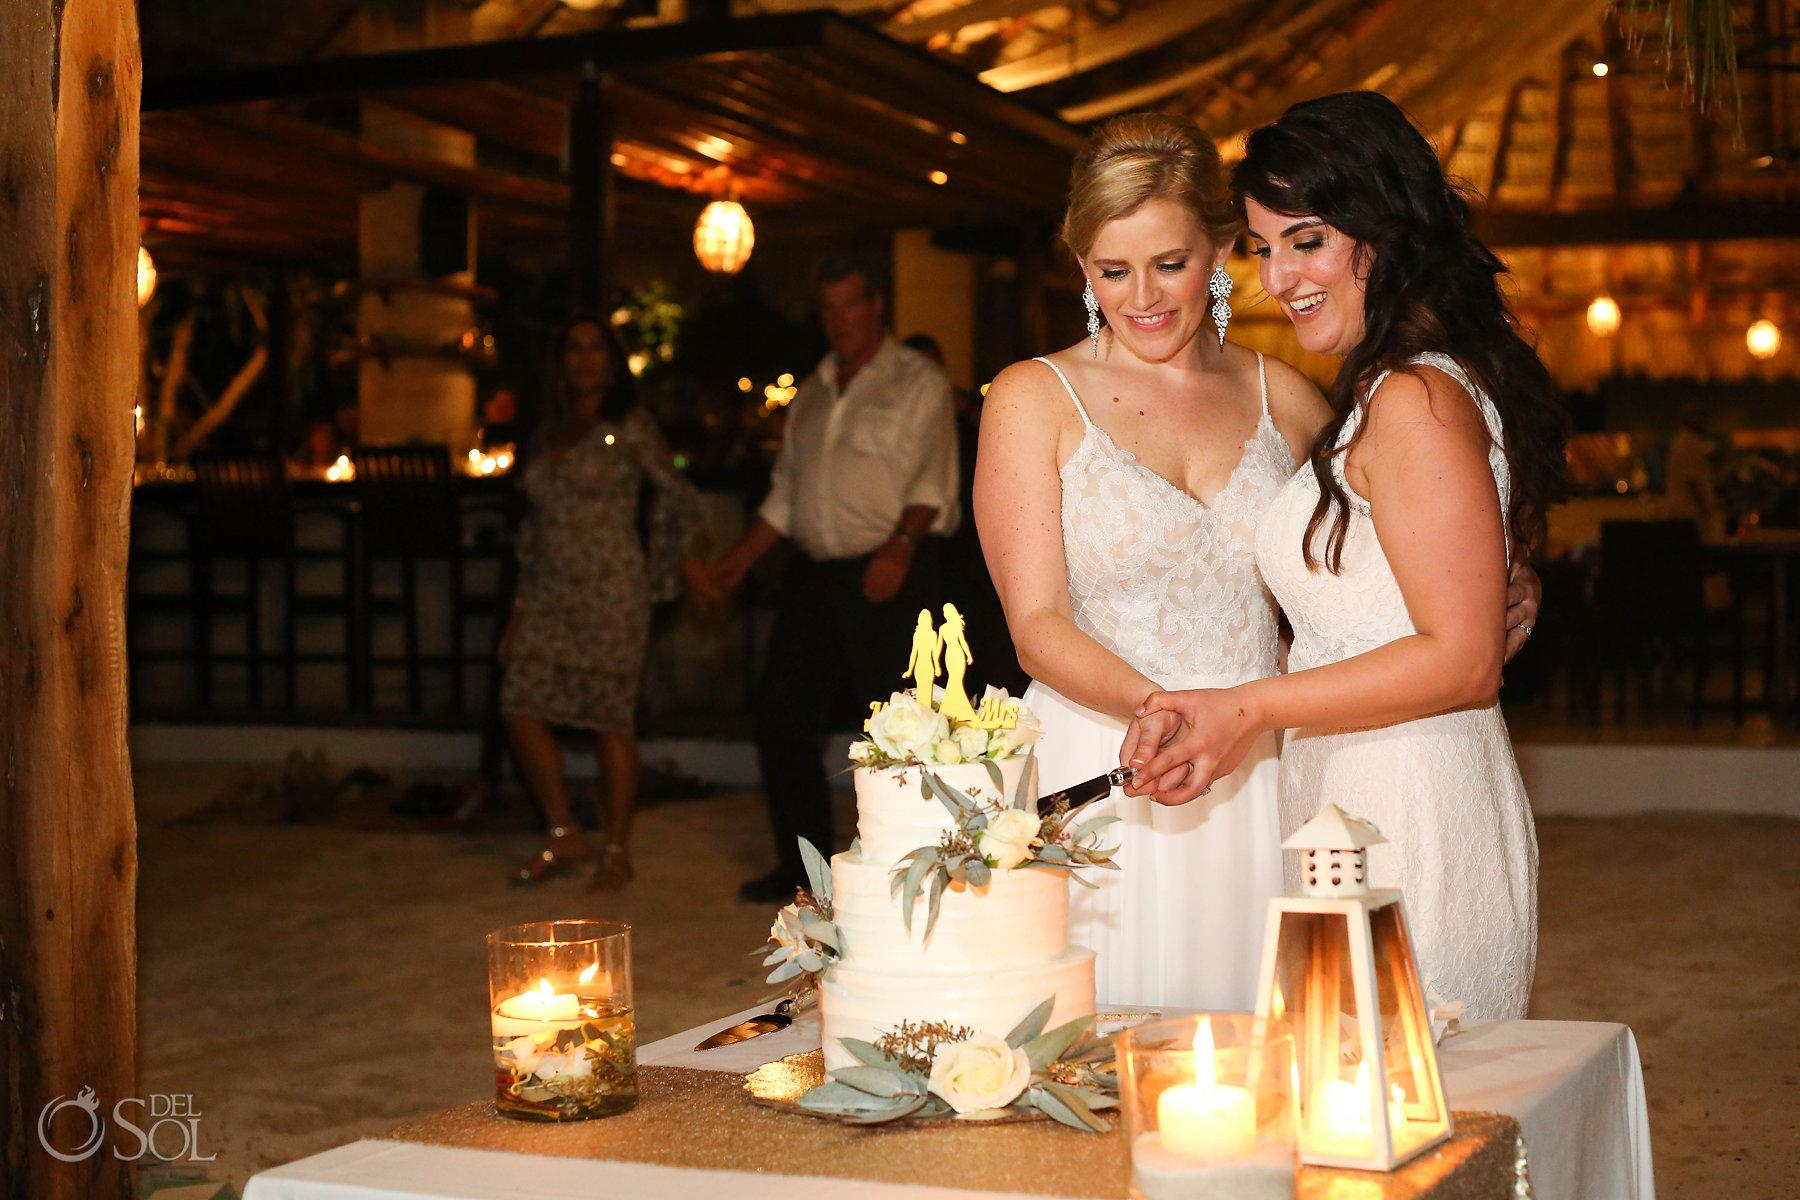 queer lesbian lgbt Brides cutting cake